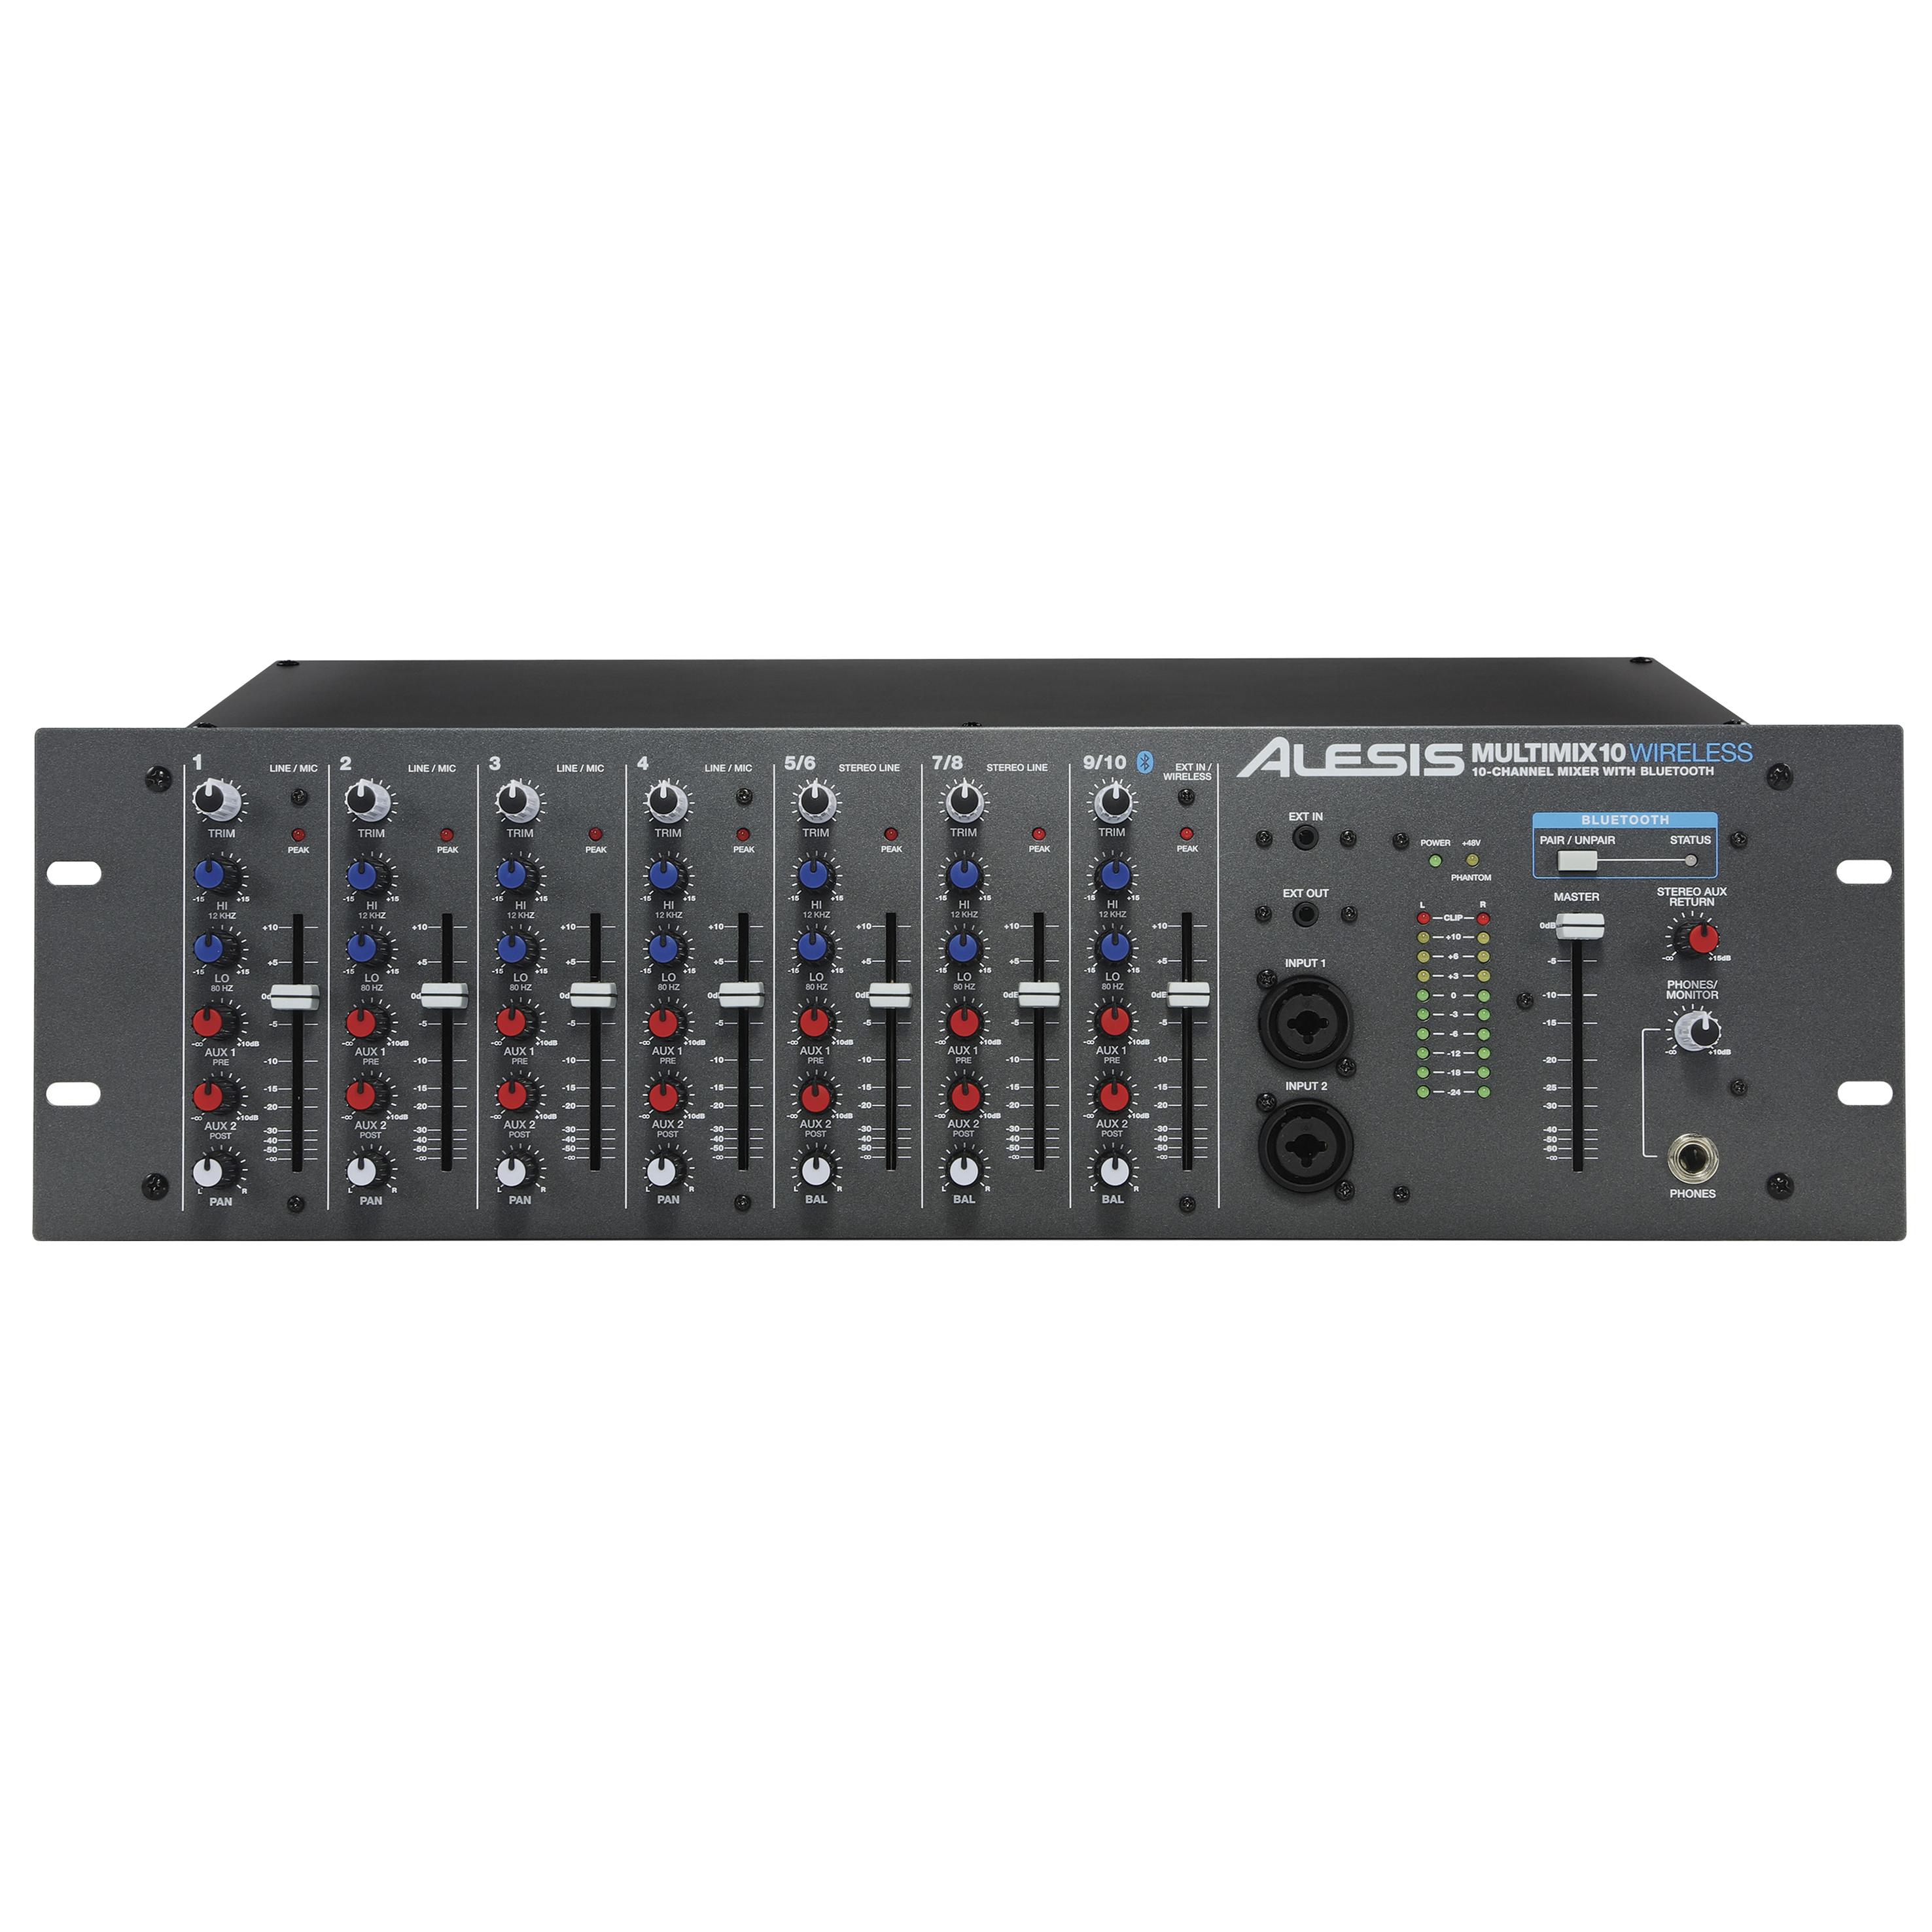 Alesis MultiMix 10 Wireless 226807